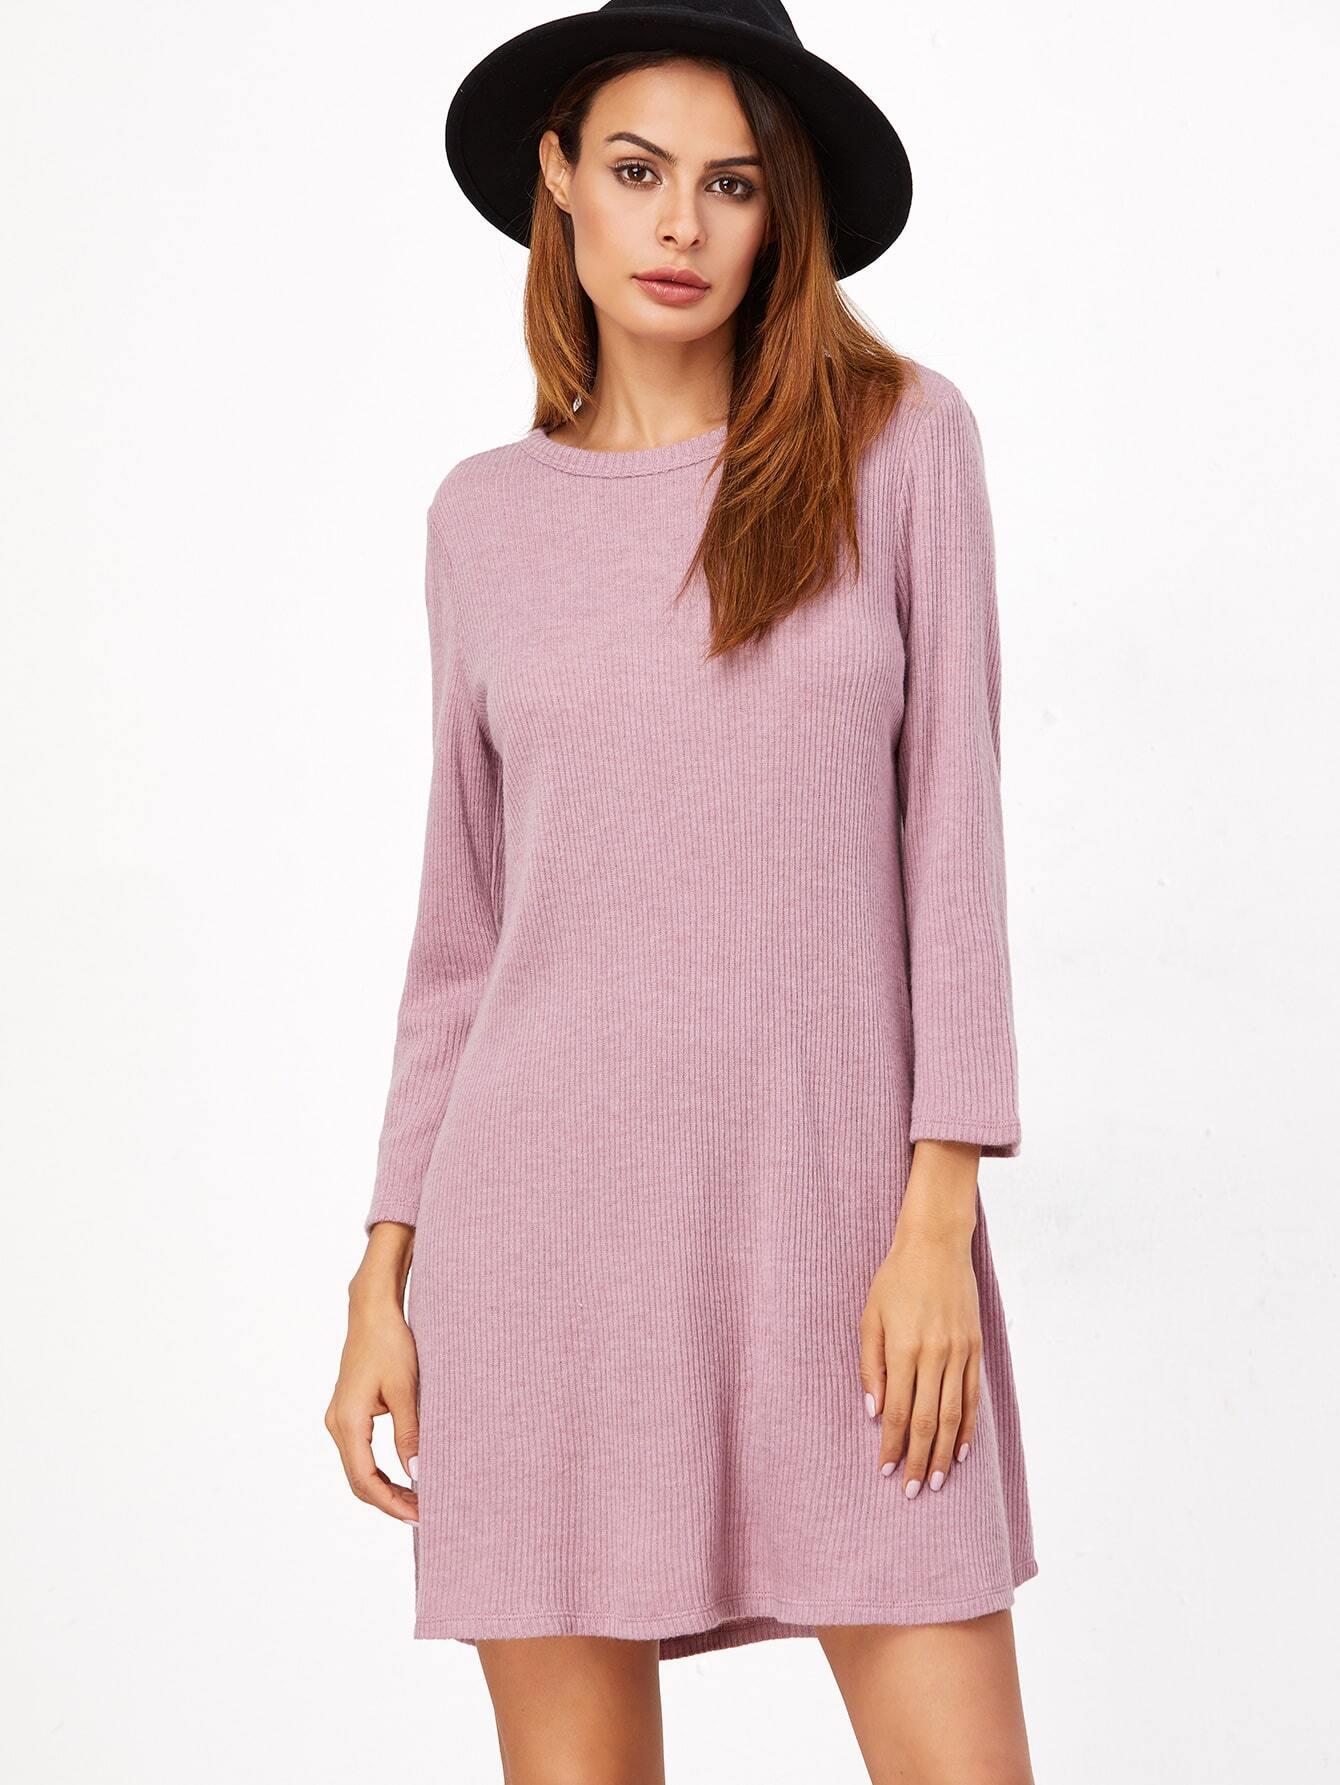 Pink Ribbed Knit A Line Dress dress161111717